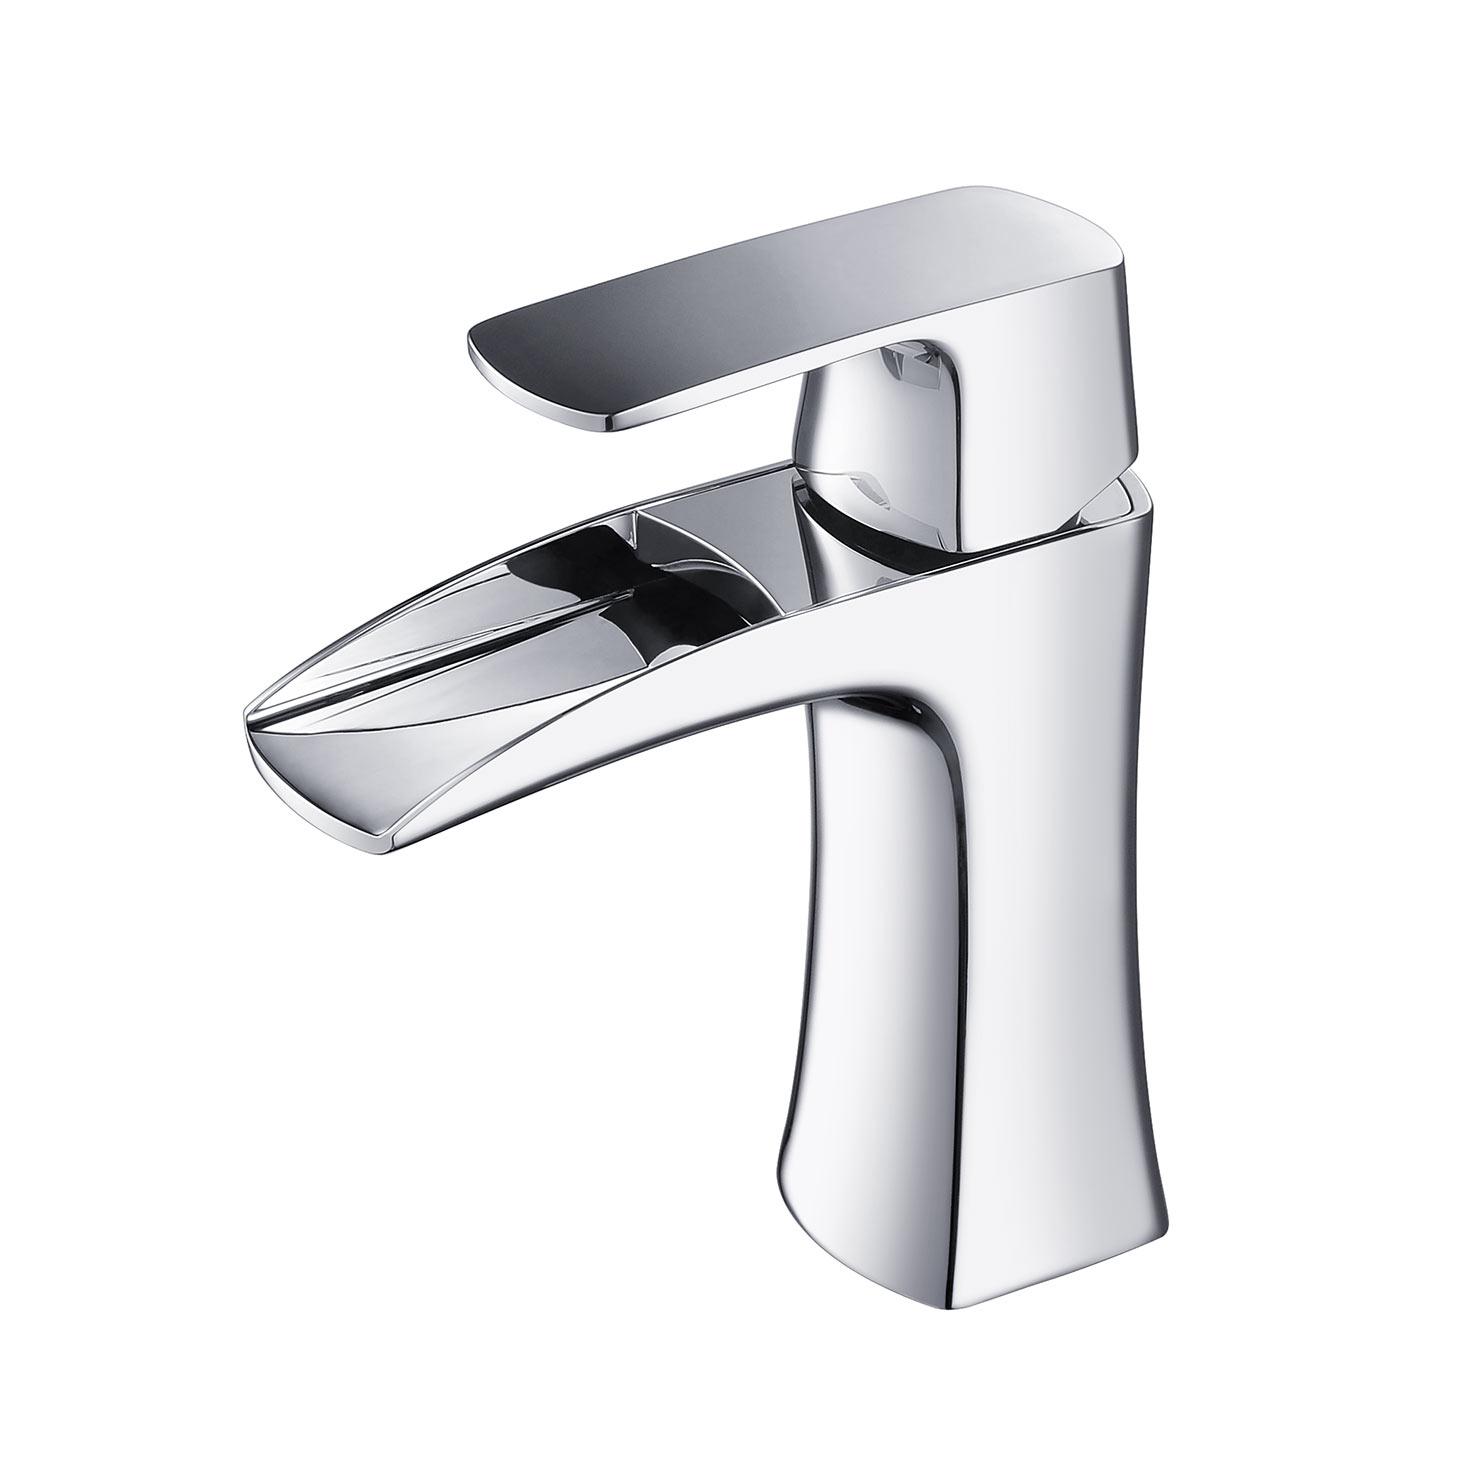 Buy CBI Rainier Single Control Bathroom Waterfall Faucet in Chrome ...